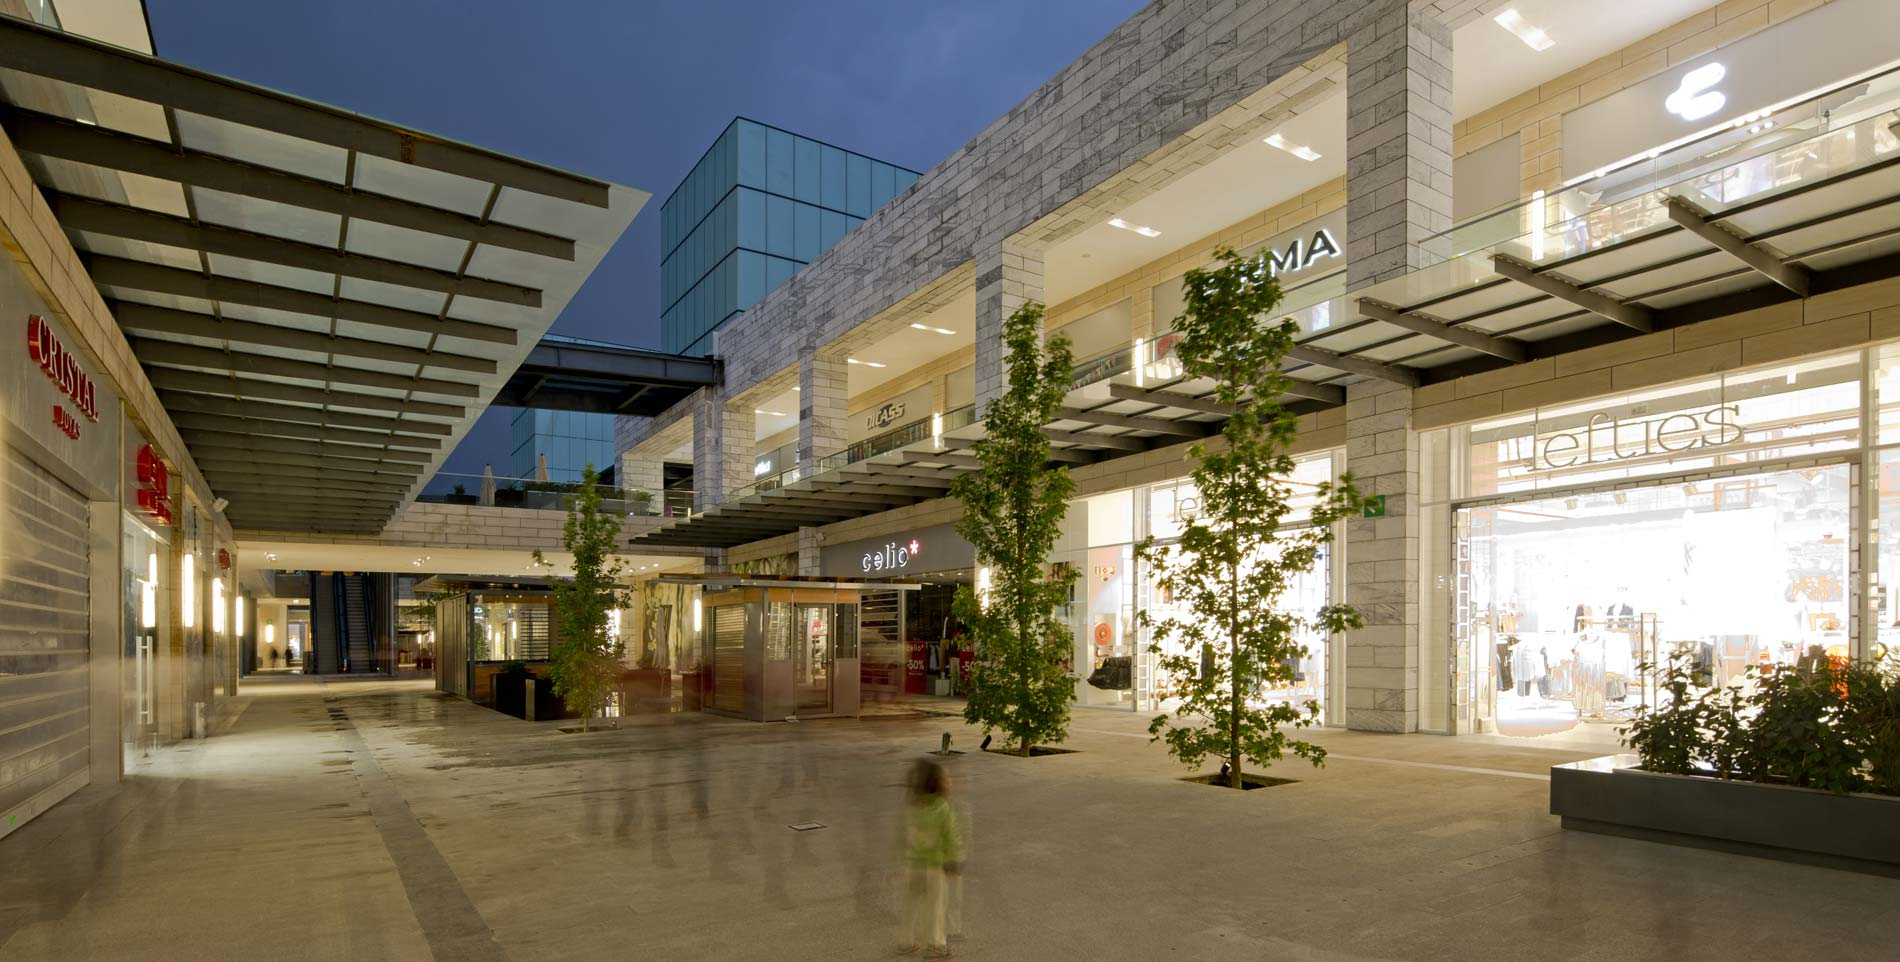 Centro comercial v a vallejo white and grey granite - Centro comercial moda shoping ...